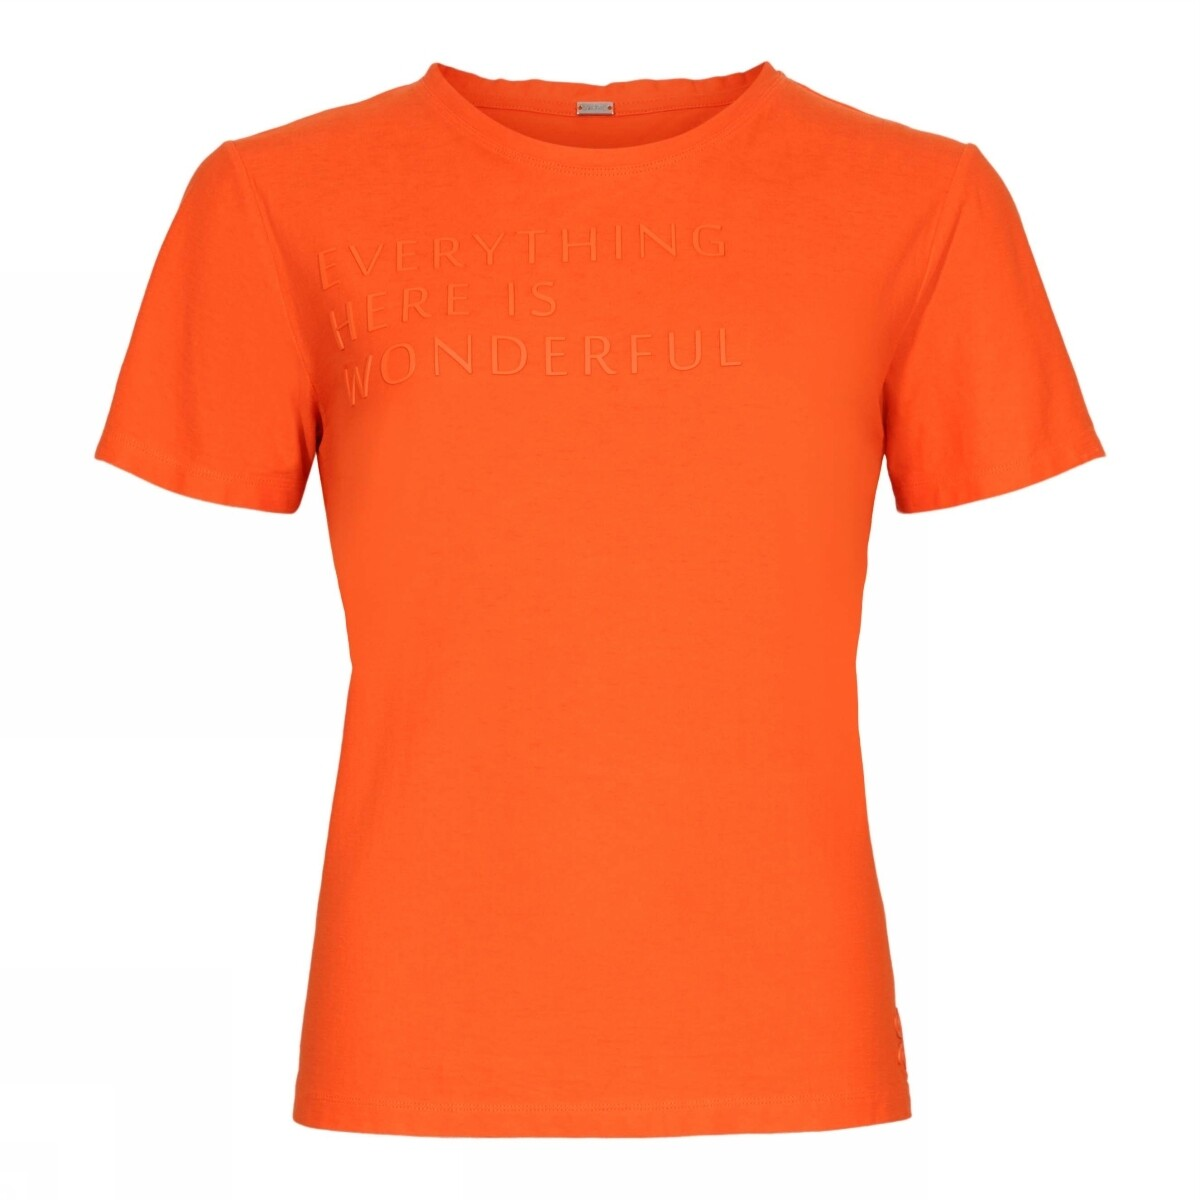 Statement t-shirt-Brann